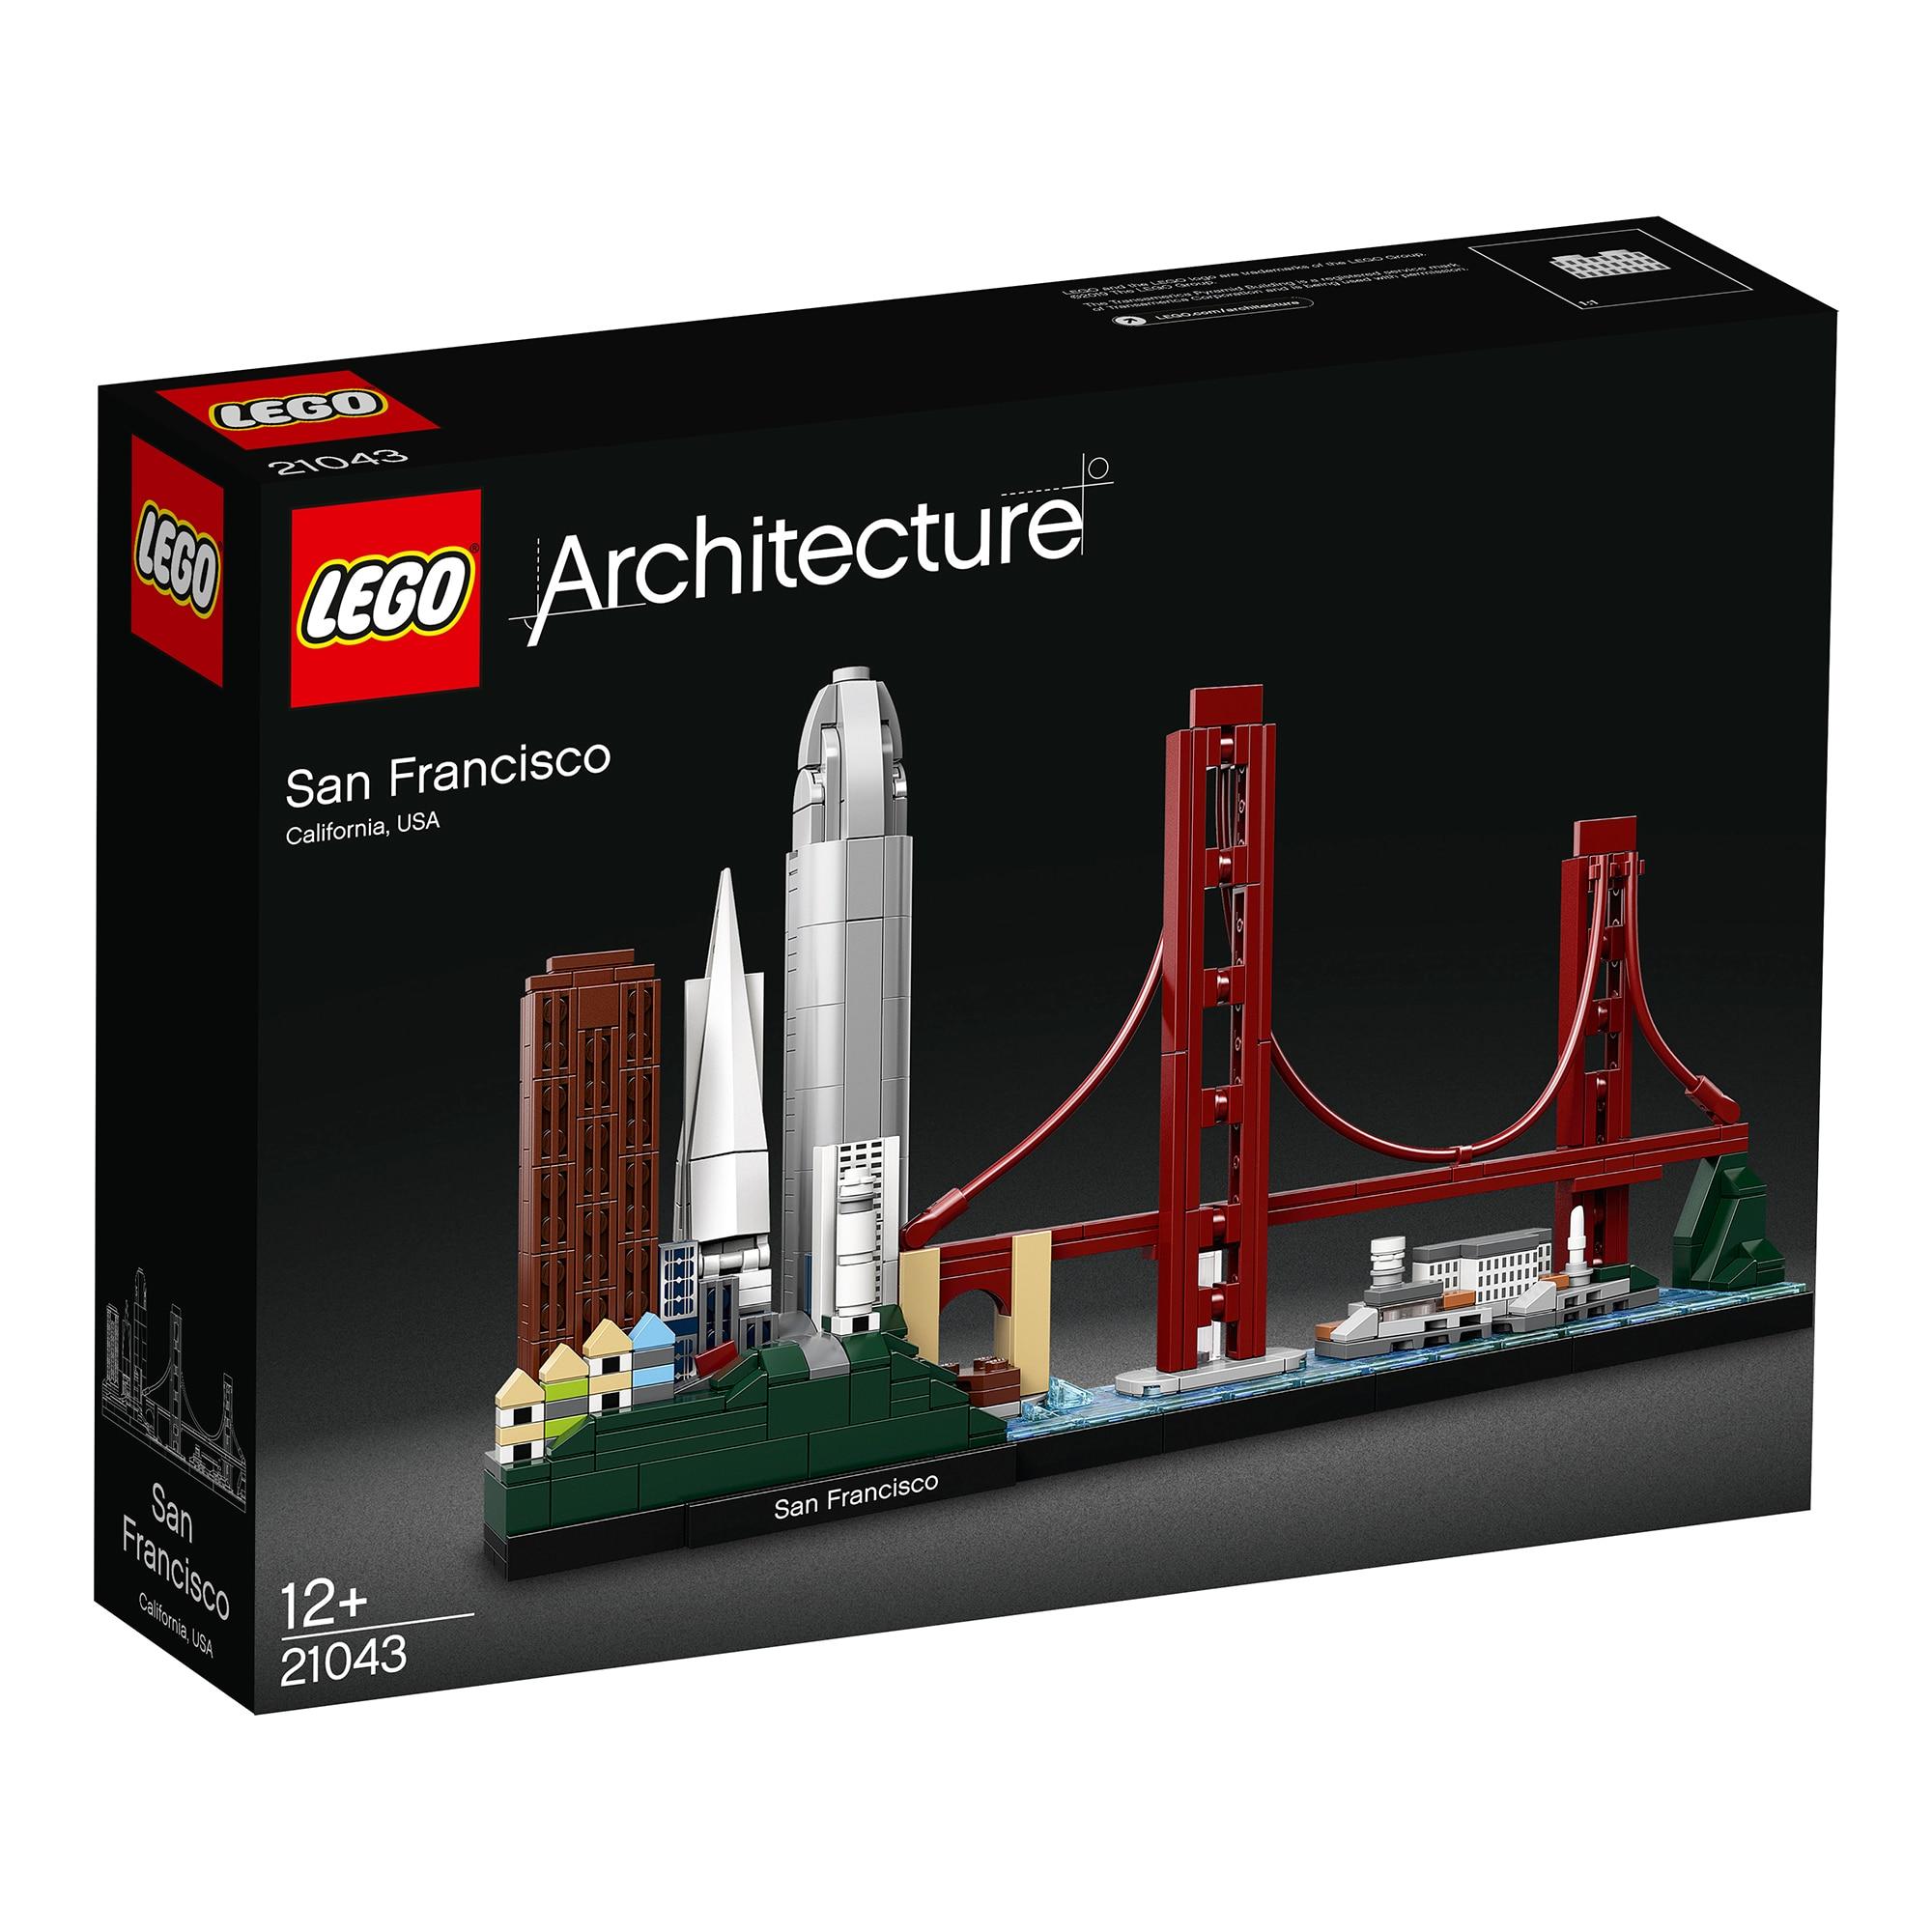 Fotografie LEGO Architecture - San Francisco 21043, 565 piese